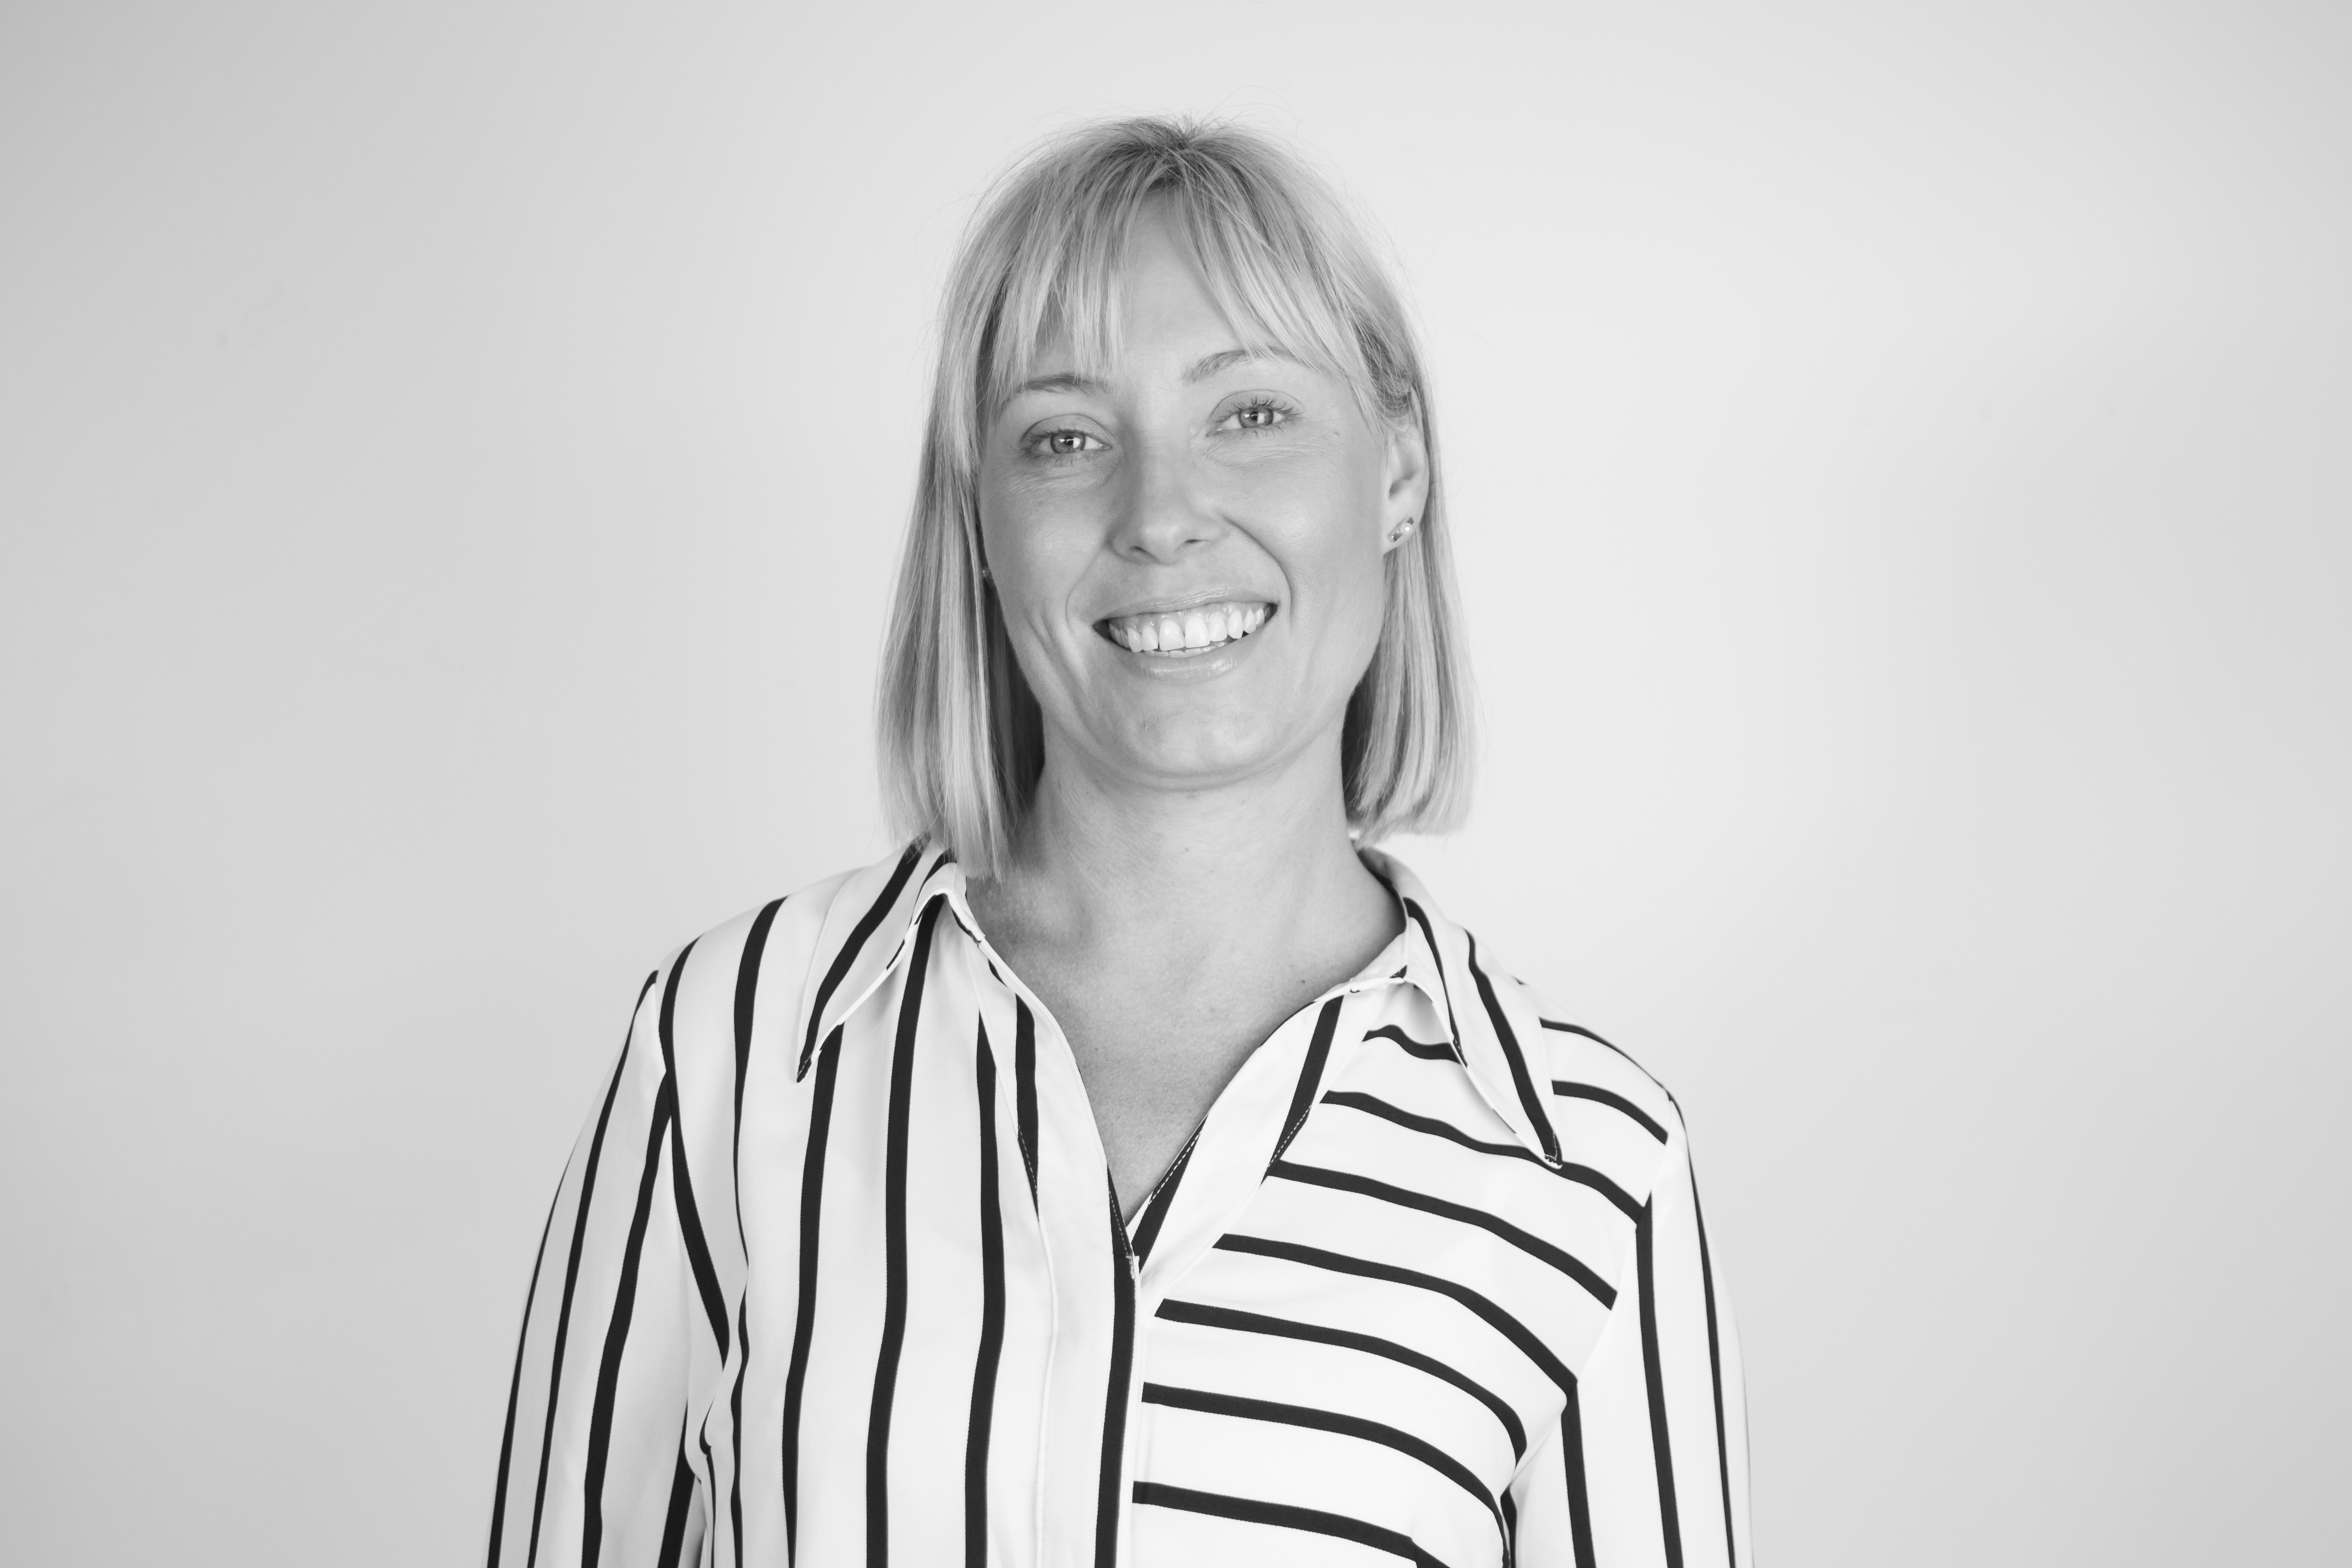 M&C Saatchi media shop Bohemia snares Tessa Mahoney from Vizeum for media director role